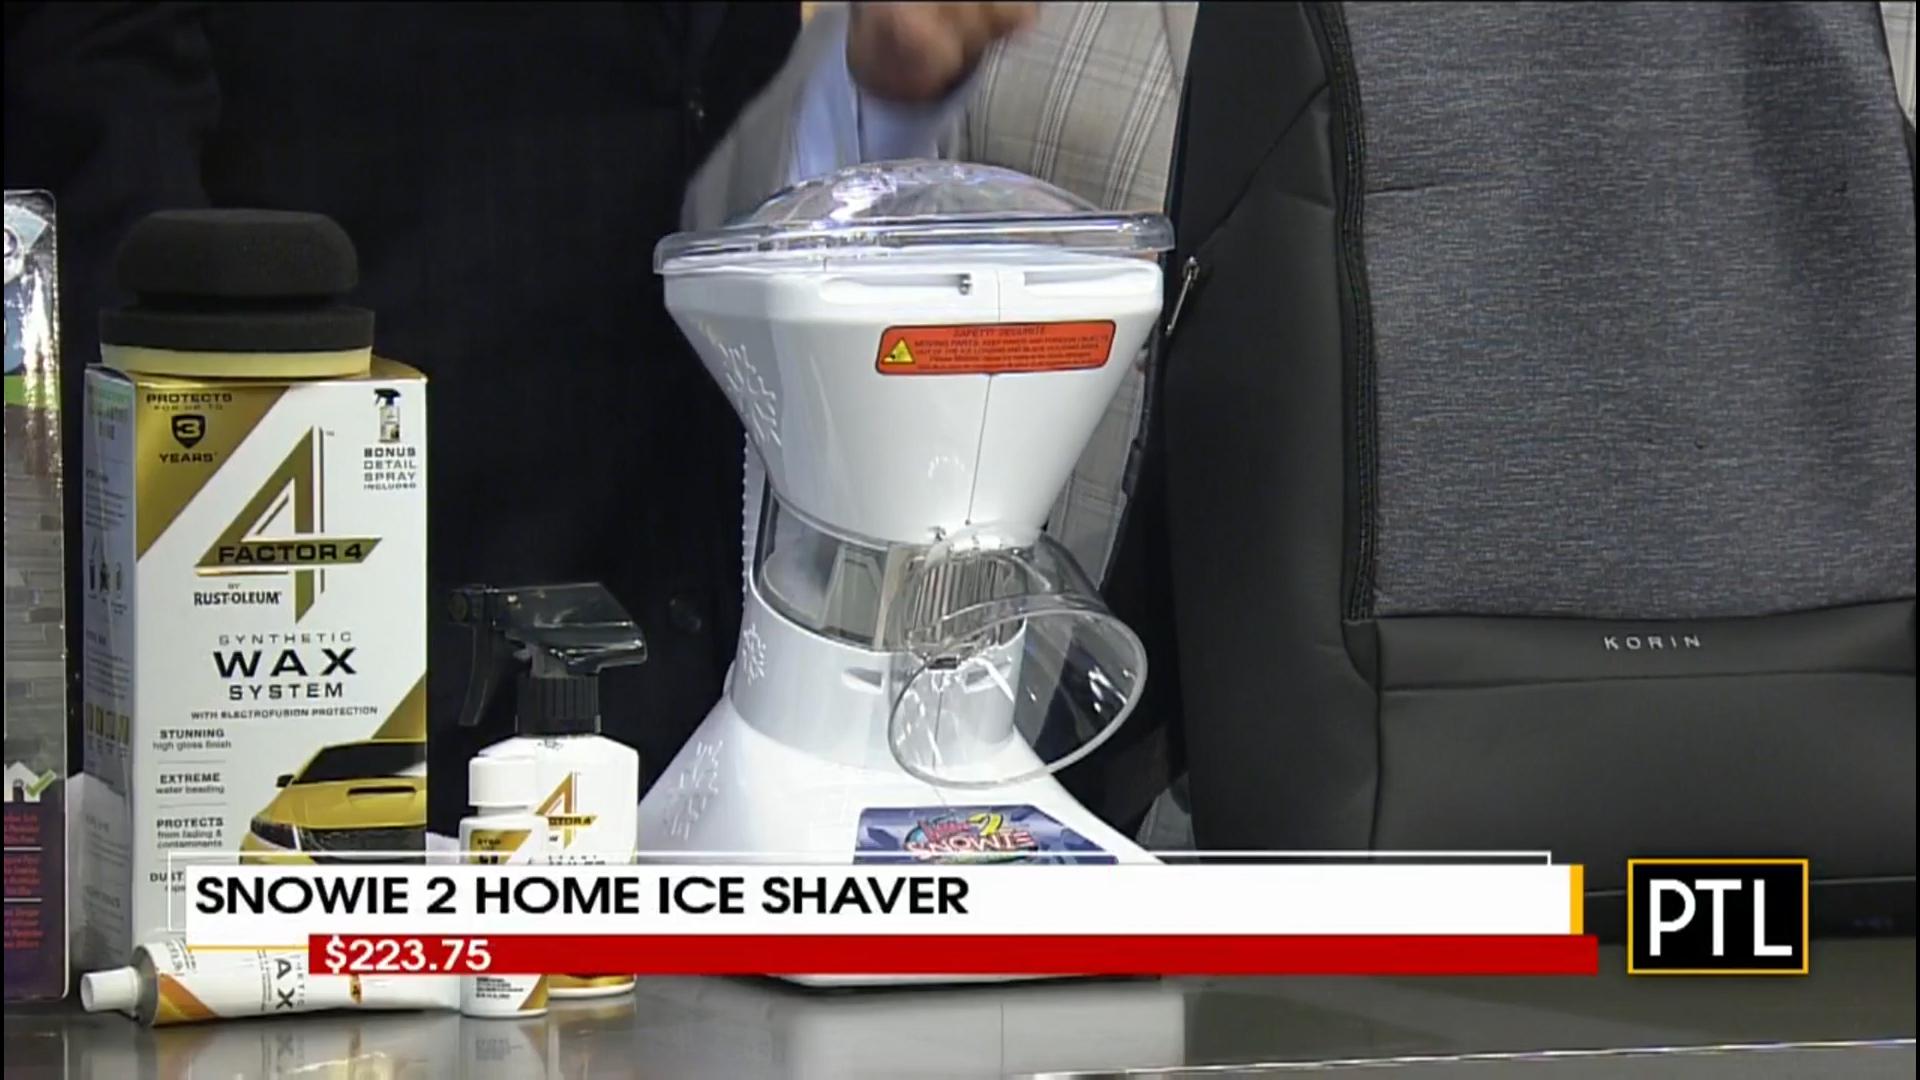 SNOWIE 2 HOME ICE SHAVER - $223.75Shop Now